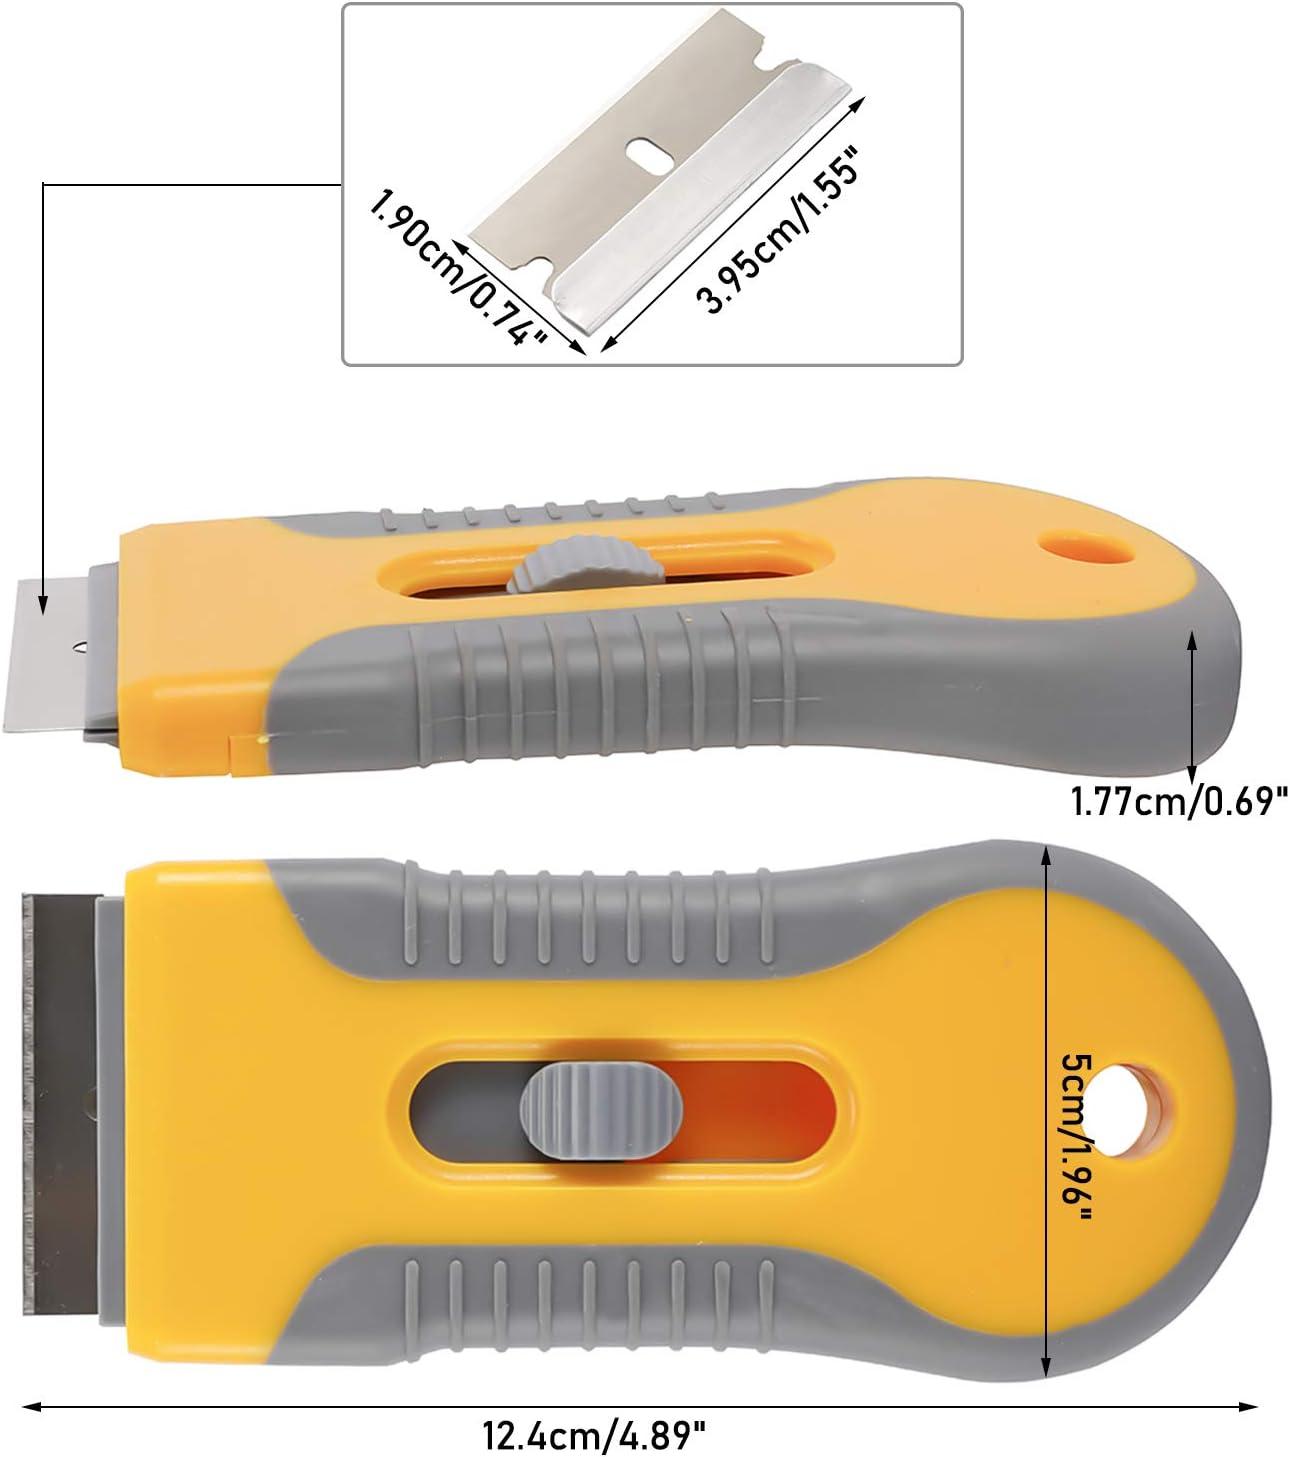 3 Pieces Retractable Razor Blade Scraper Holder with 60 pc Extra Razor Blades Mini Plastic Scraper Labels Decals Sticker Removal Scraper Tool for Window Glass Paint Cleaning